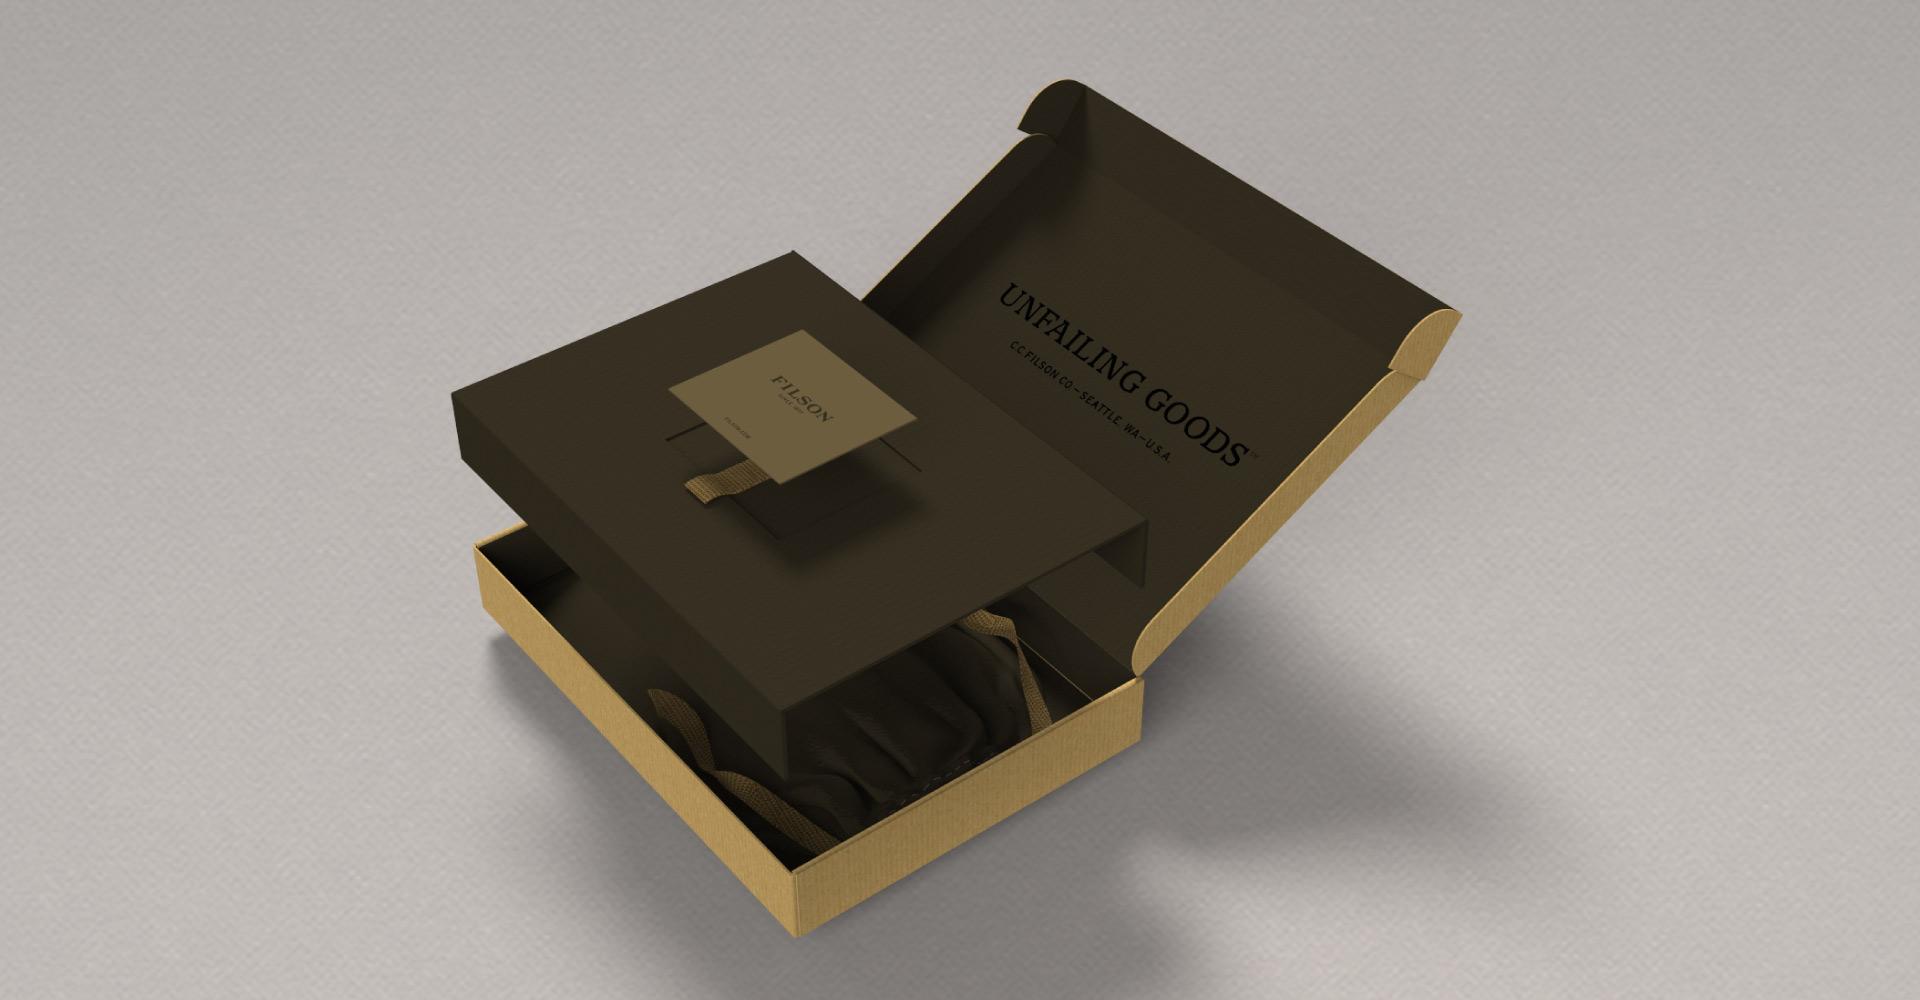 Creative_Retail_Packaging_Custom_Packaging_Structural_Design_Filson_04-1.jpg